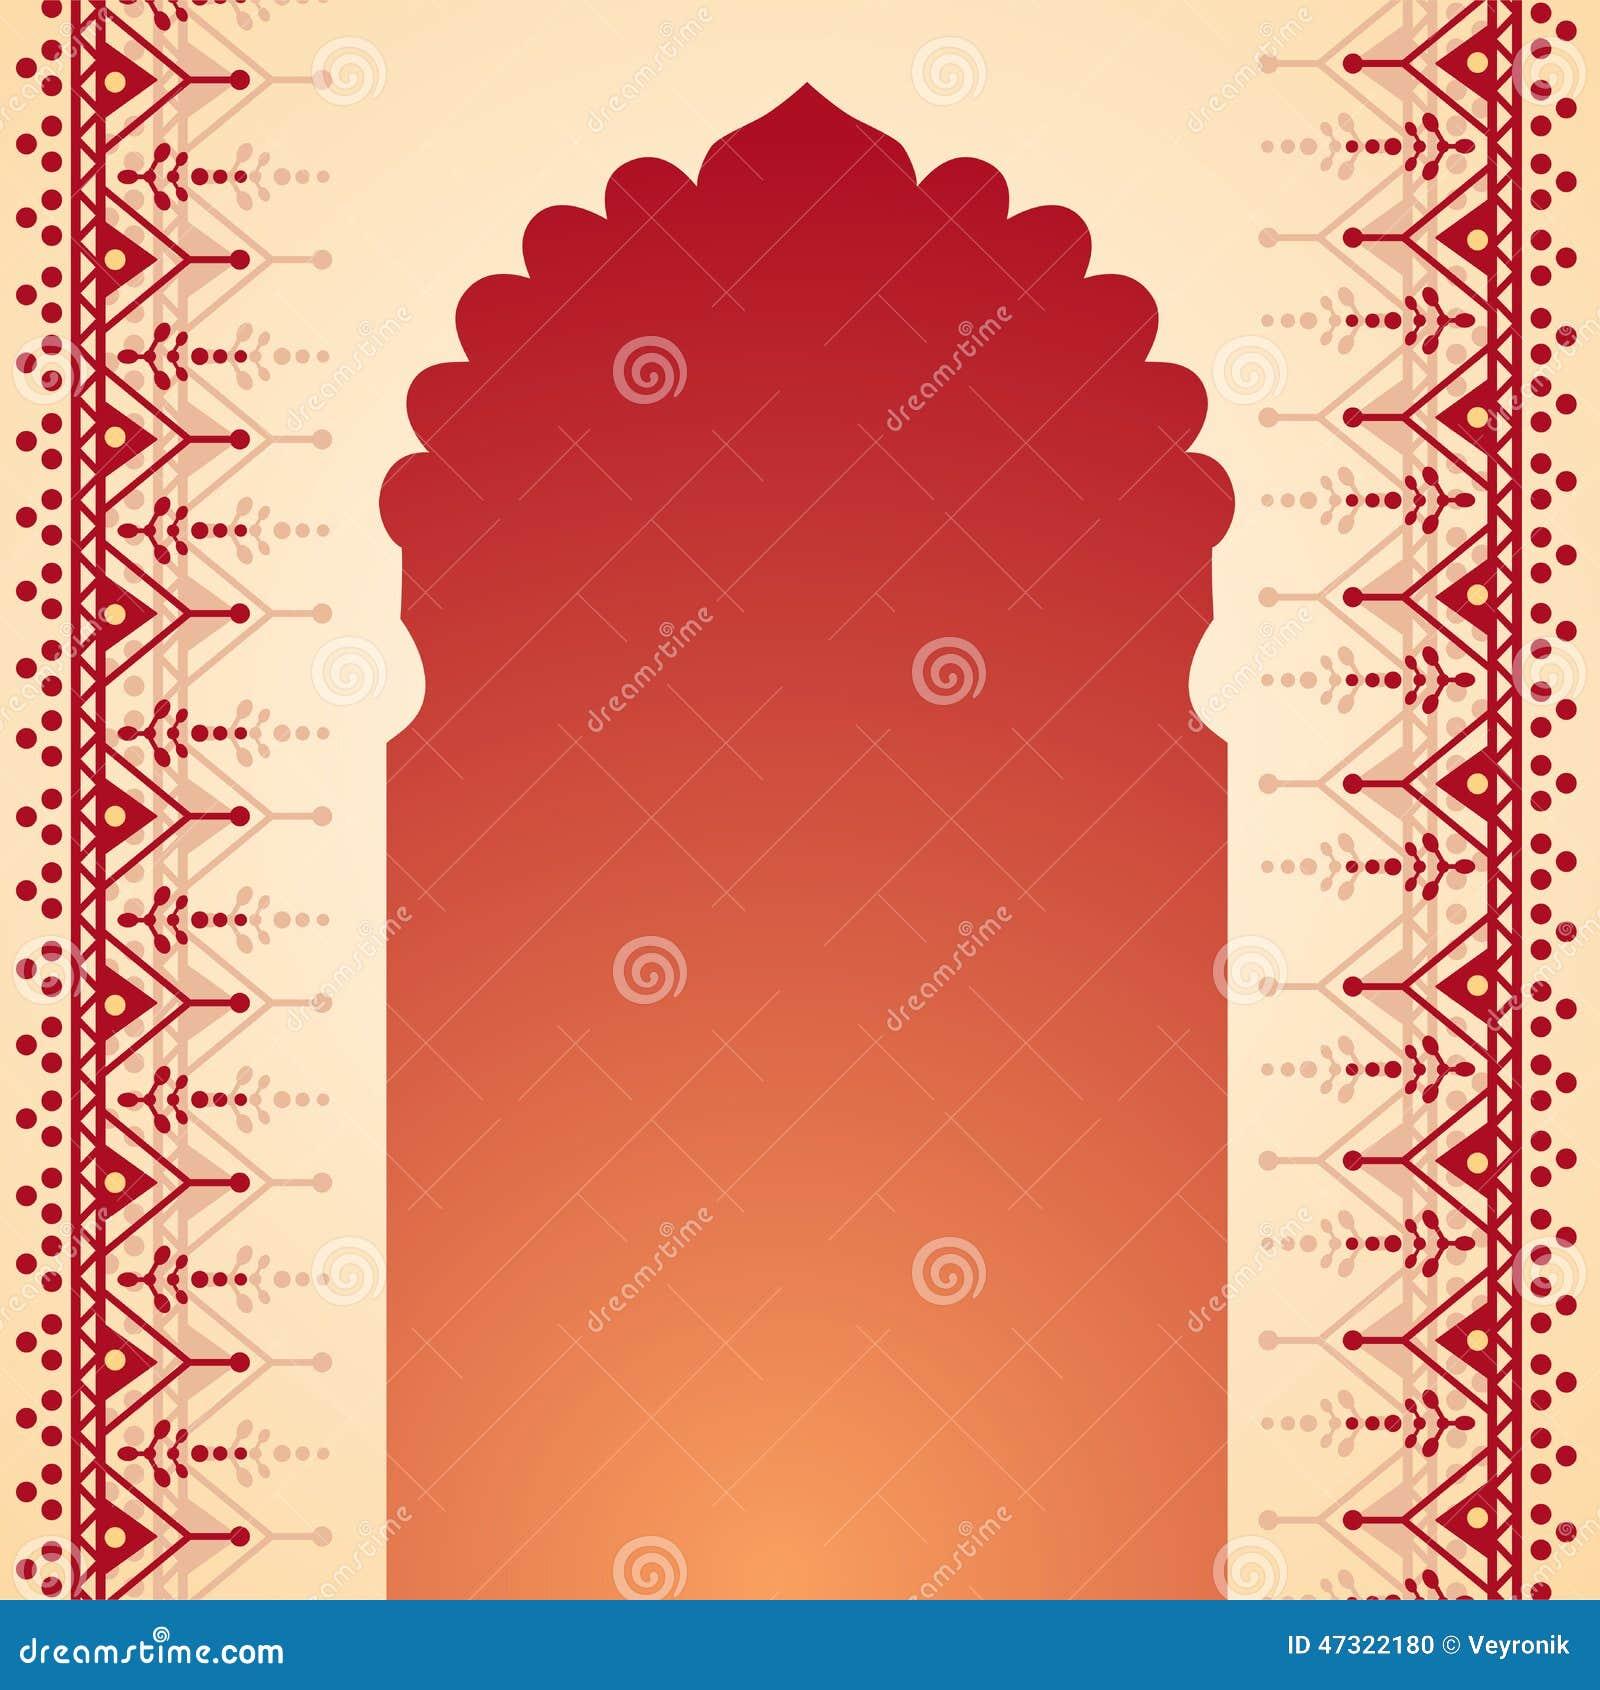 hd wallpaper birthday card